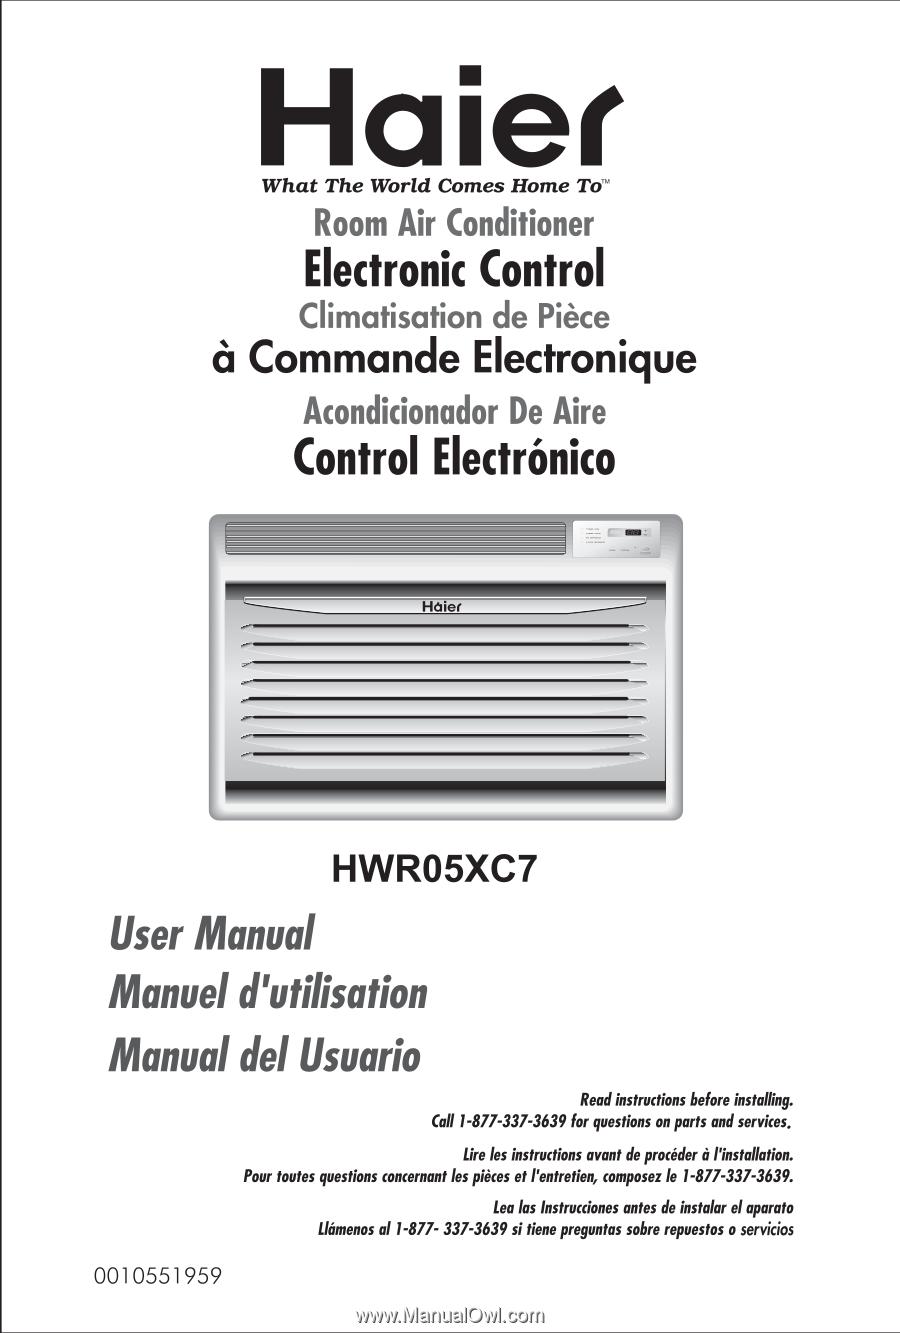 haier hwr05xc7 manual free owners manual u2022 rh wordworksbysea com Haier Commercial Cool Manual Haier Esa3089 Owner Manual